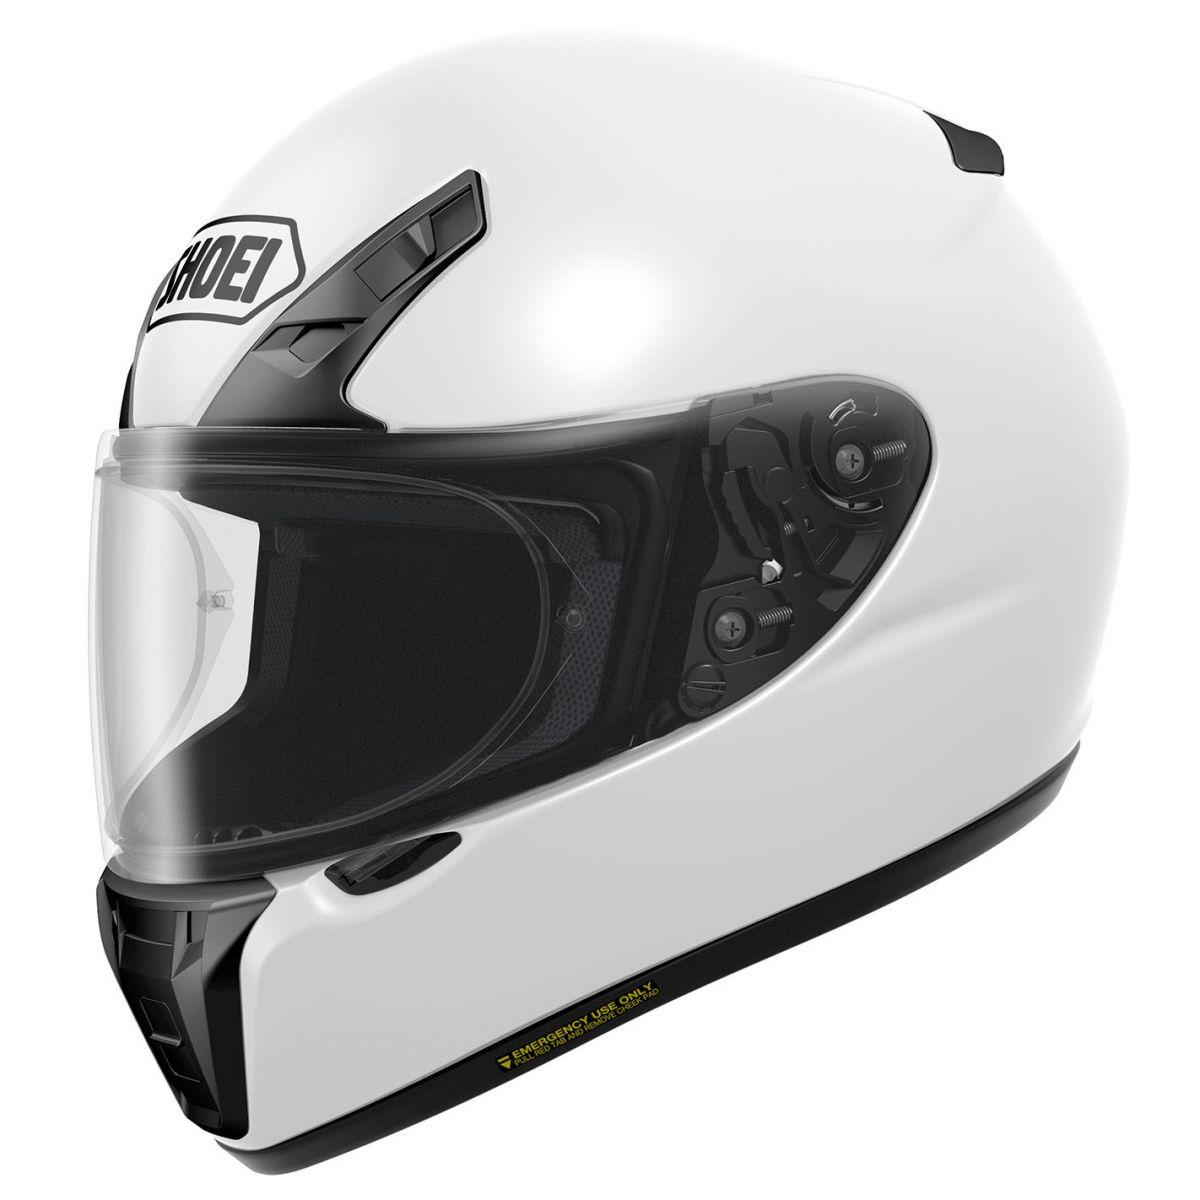 Capacete Shoei Ryd Branco Com Pinlock Anti-Embaçante - NOVO!  - Planet Bike Shop Moto Acessórios